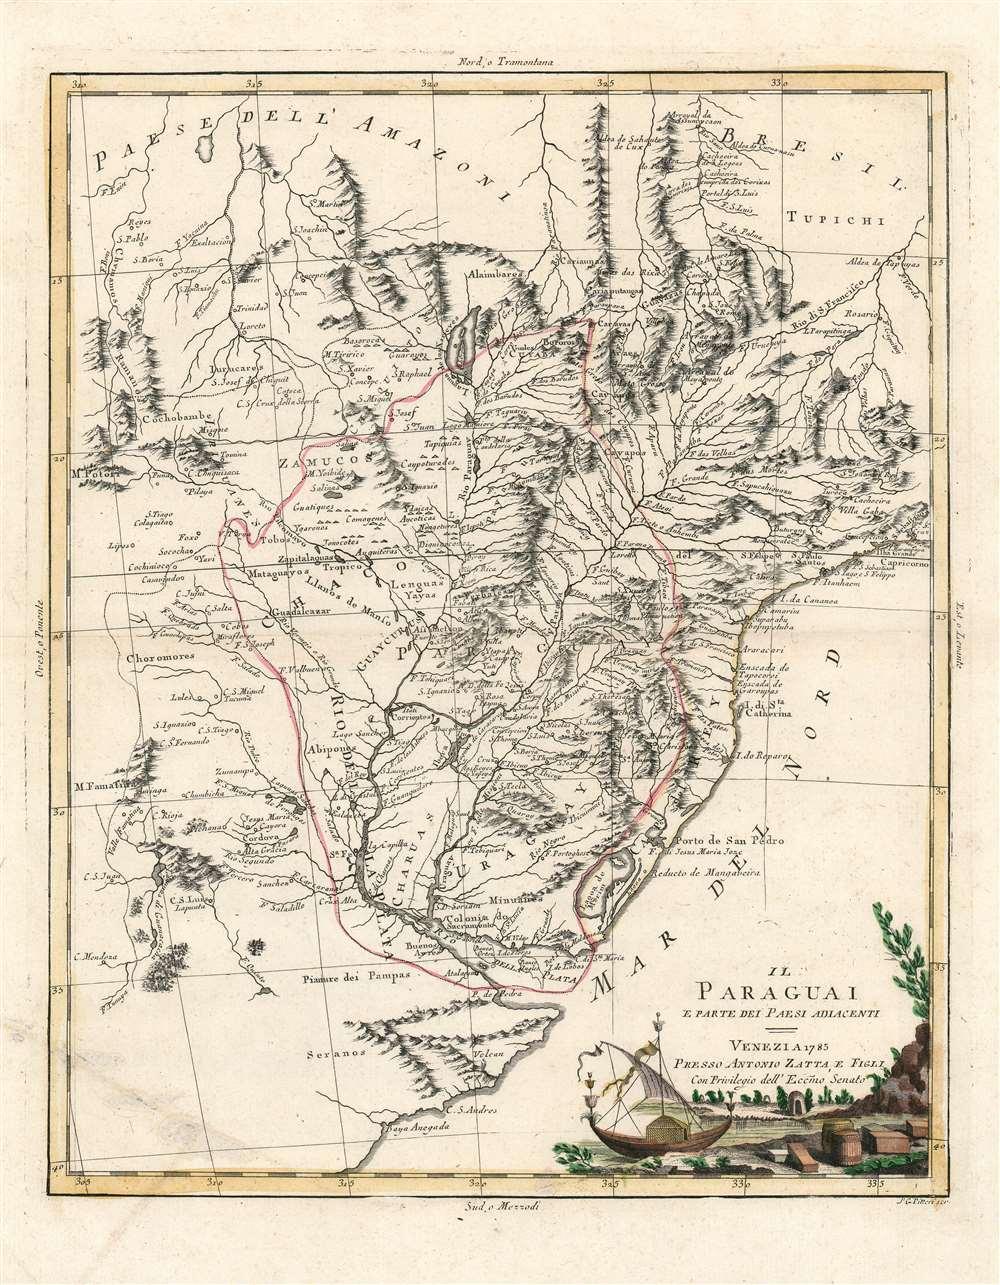 Il Paraguai E Parte Dei Paesi Adiacenti. - Main View